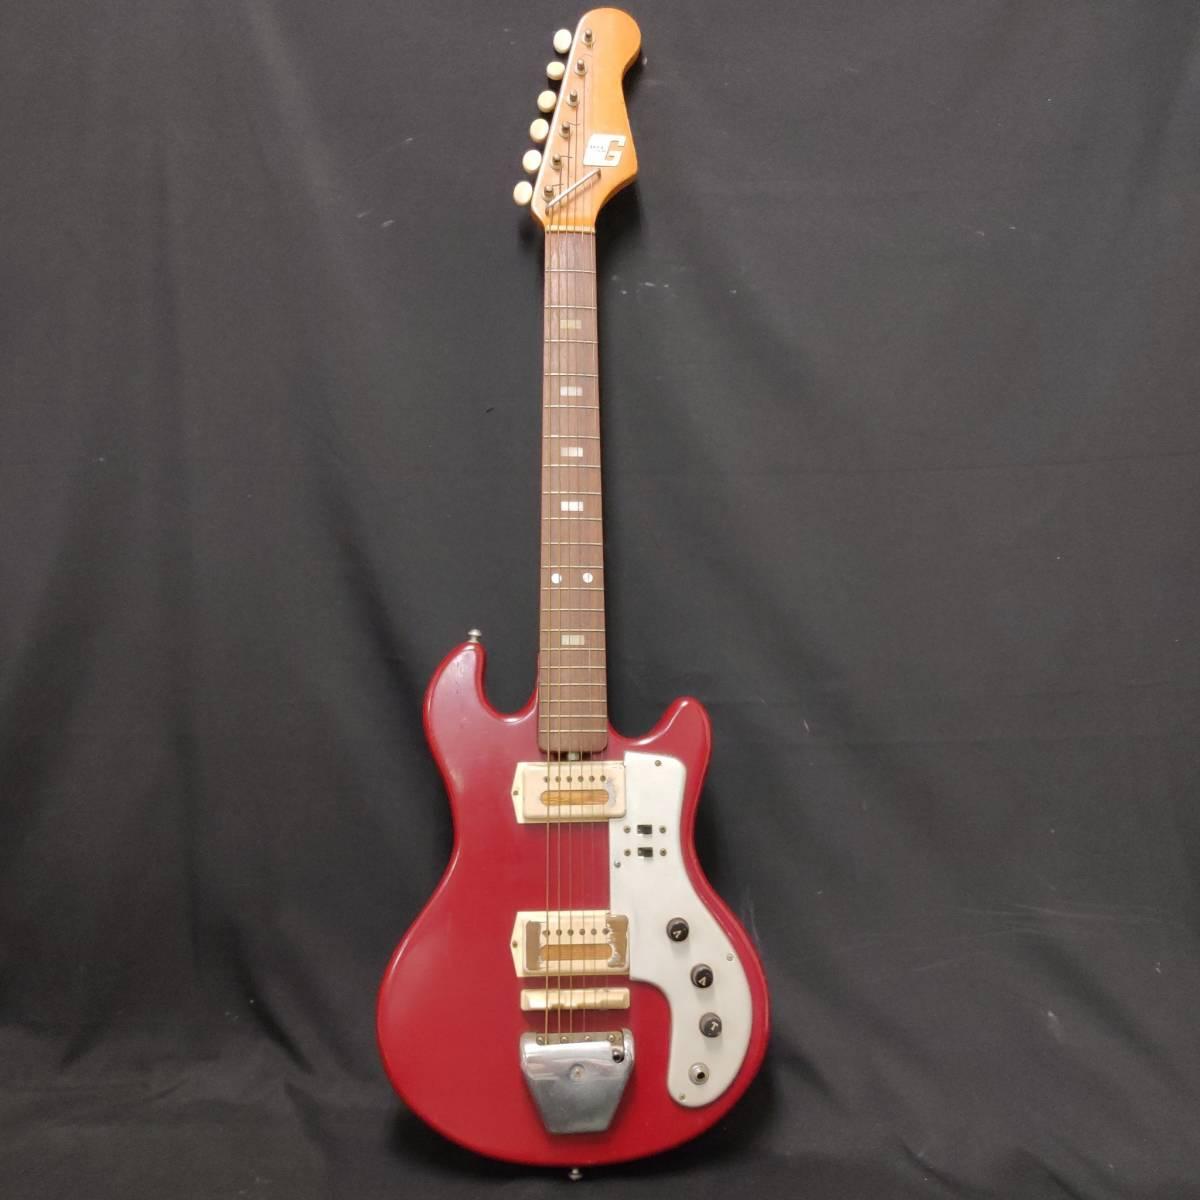 A22m11T GUYA TONE エレキギター LG-85T 本体 約100cm グヤトーン ビンテージ レッド 赤色